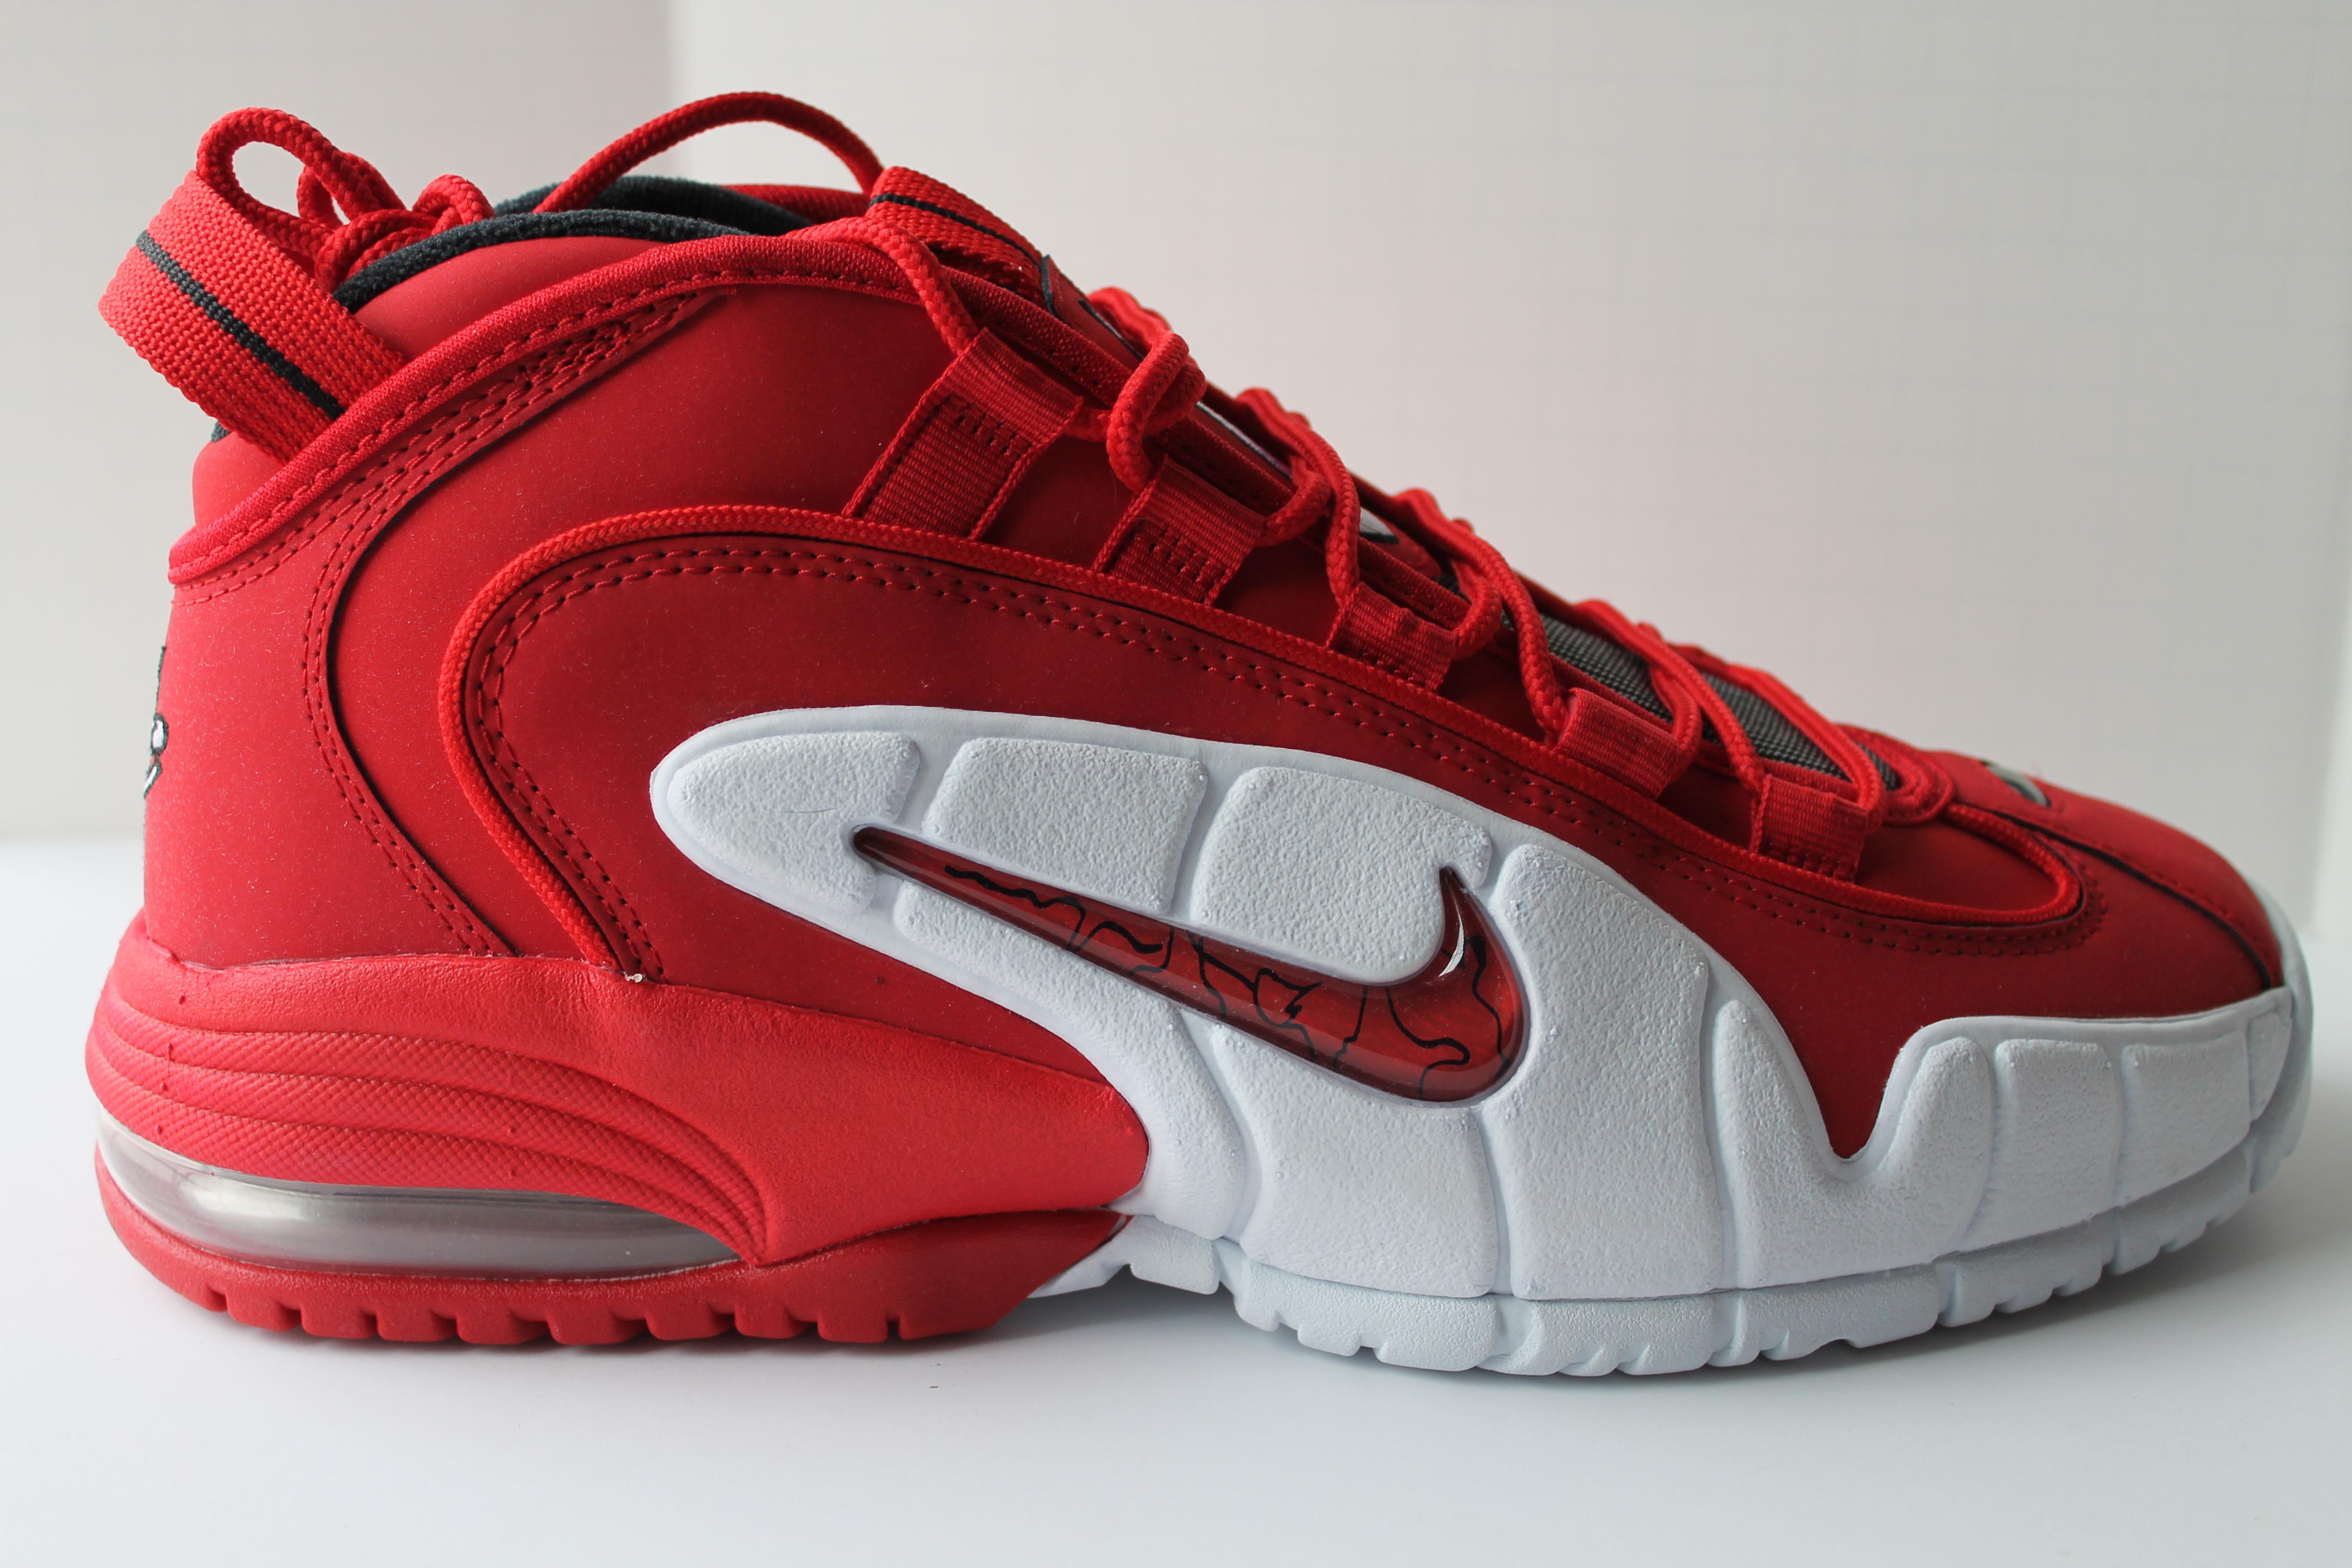 AuthentKicks | Nike Air Max Penny 1